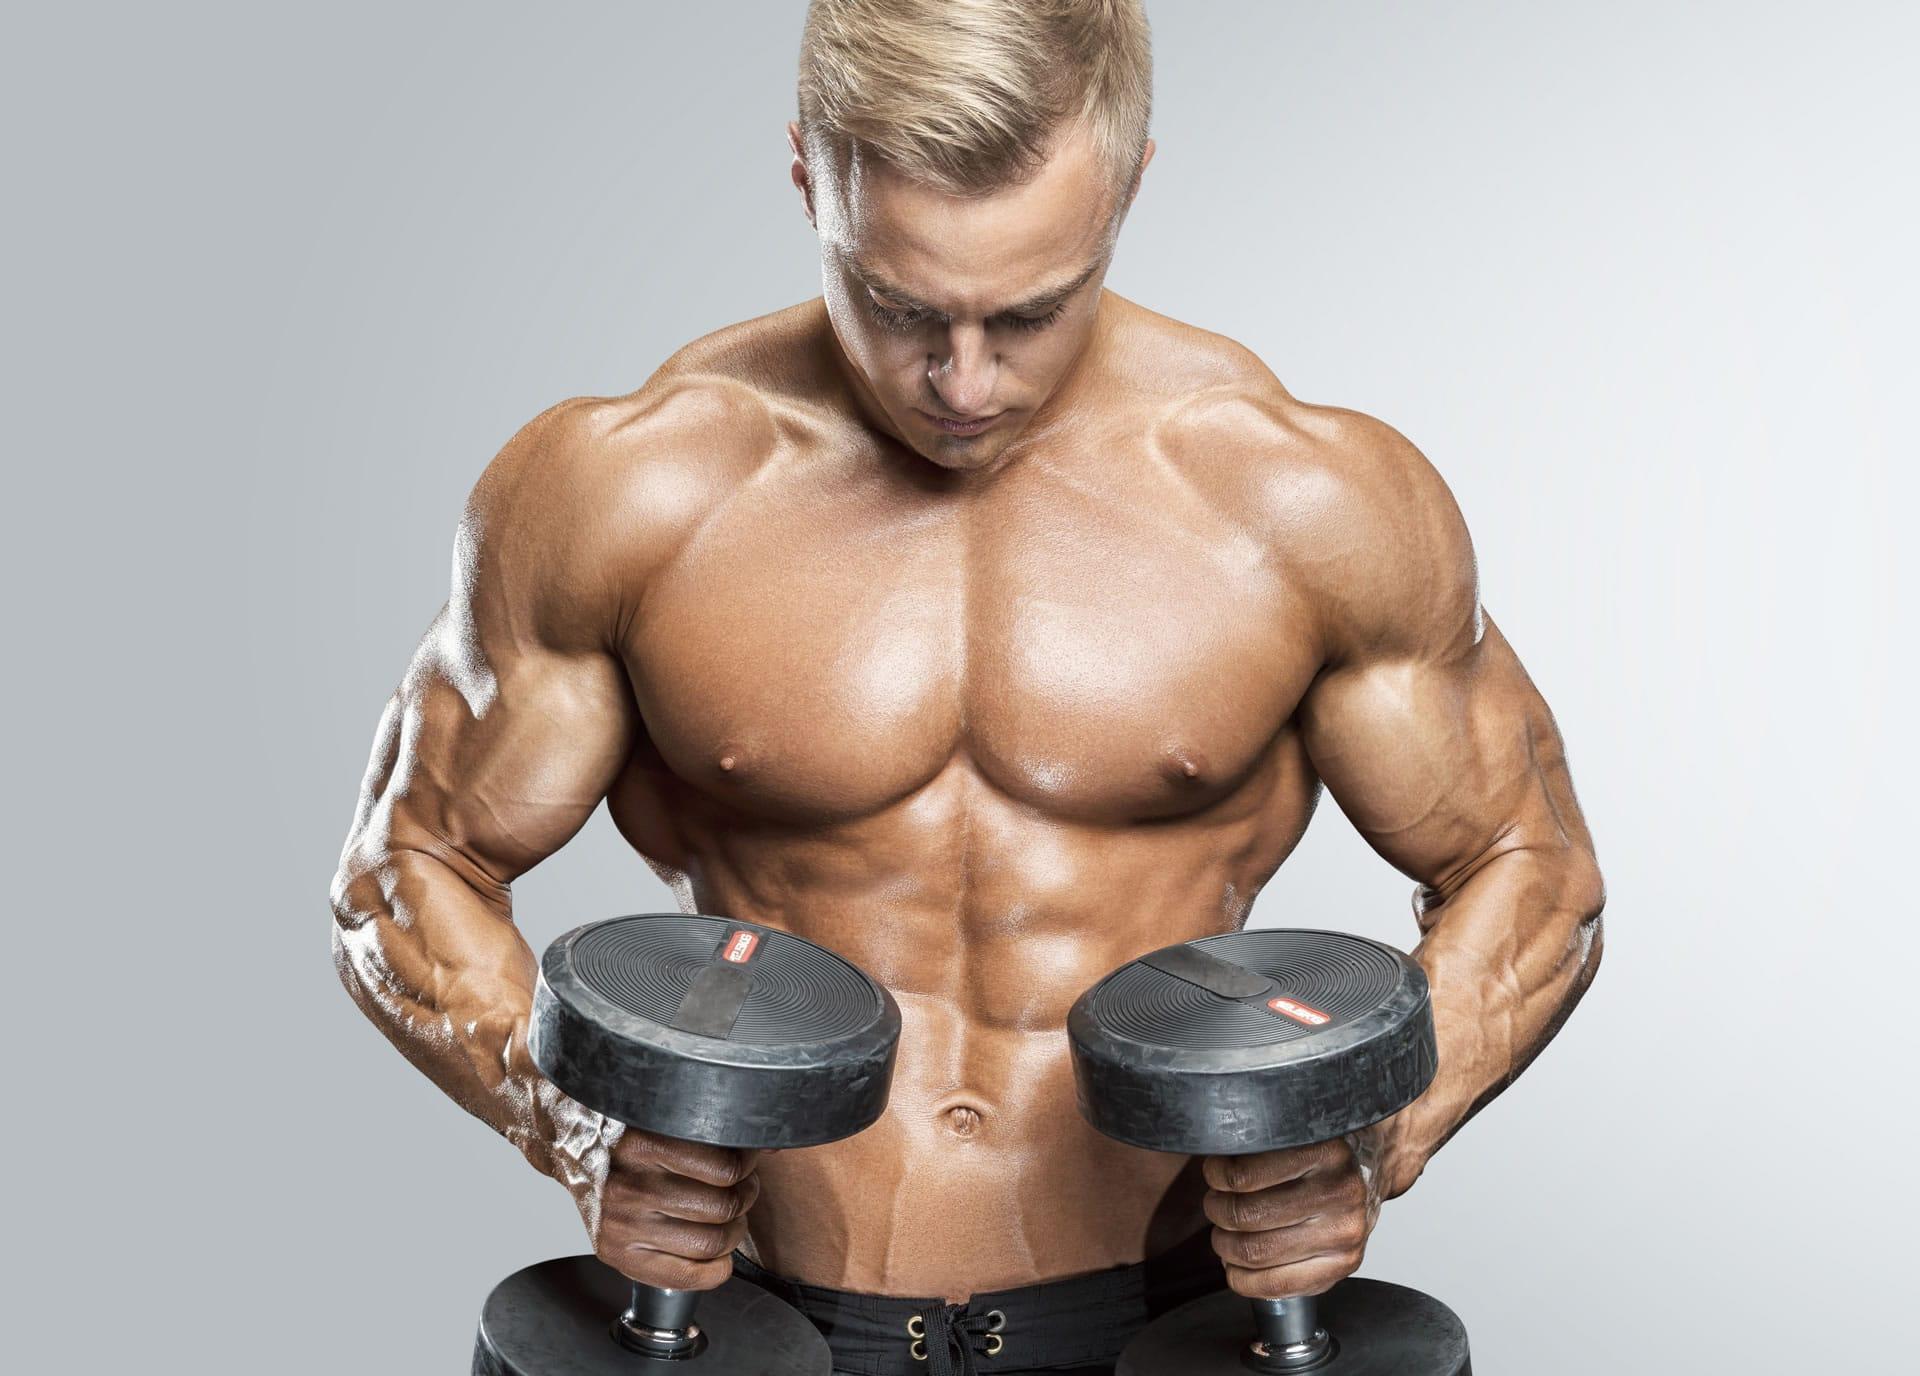 dieta online para ganar masa muscular